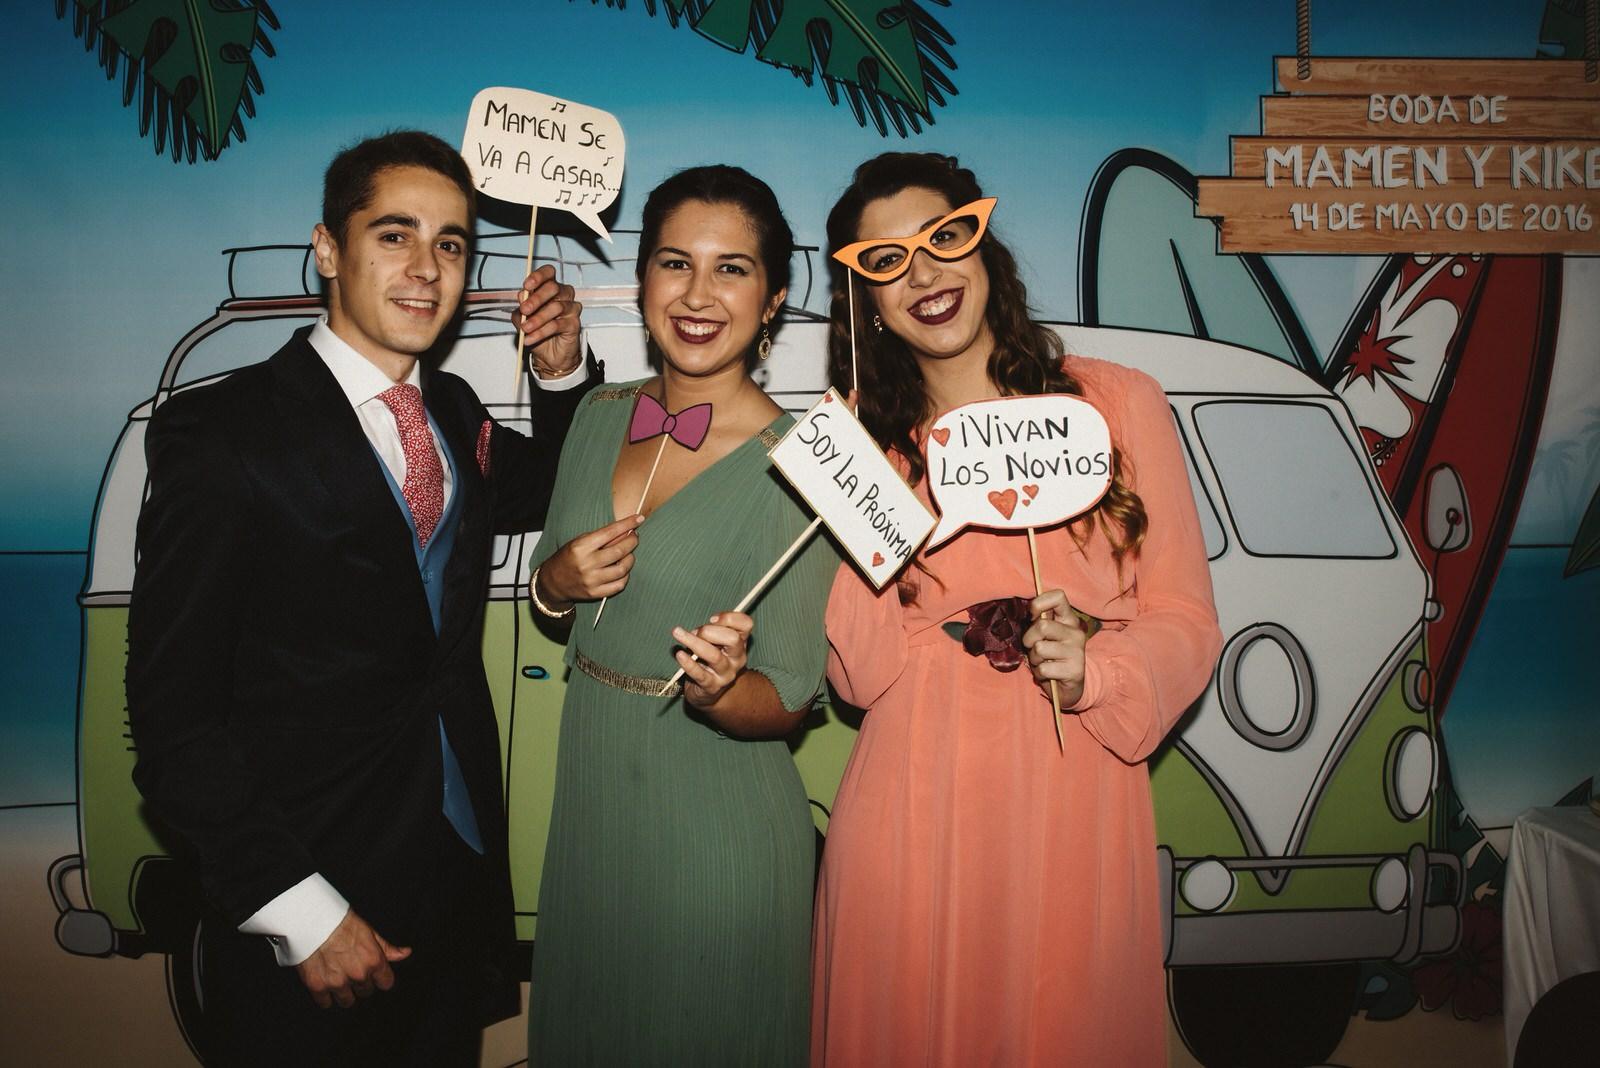 fotografo de bodas sevilla - fotografo boda - fotografía sevilla - Andrés AmarilloAAA_3642- fine.JPG